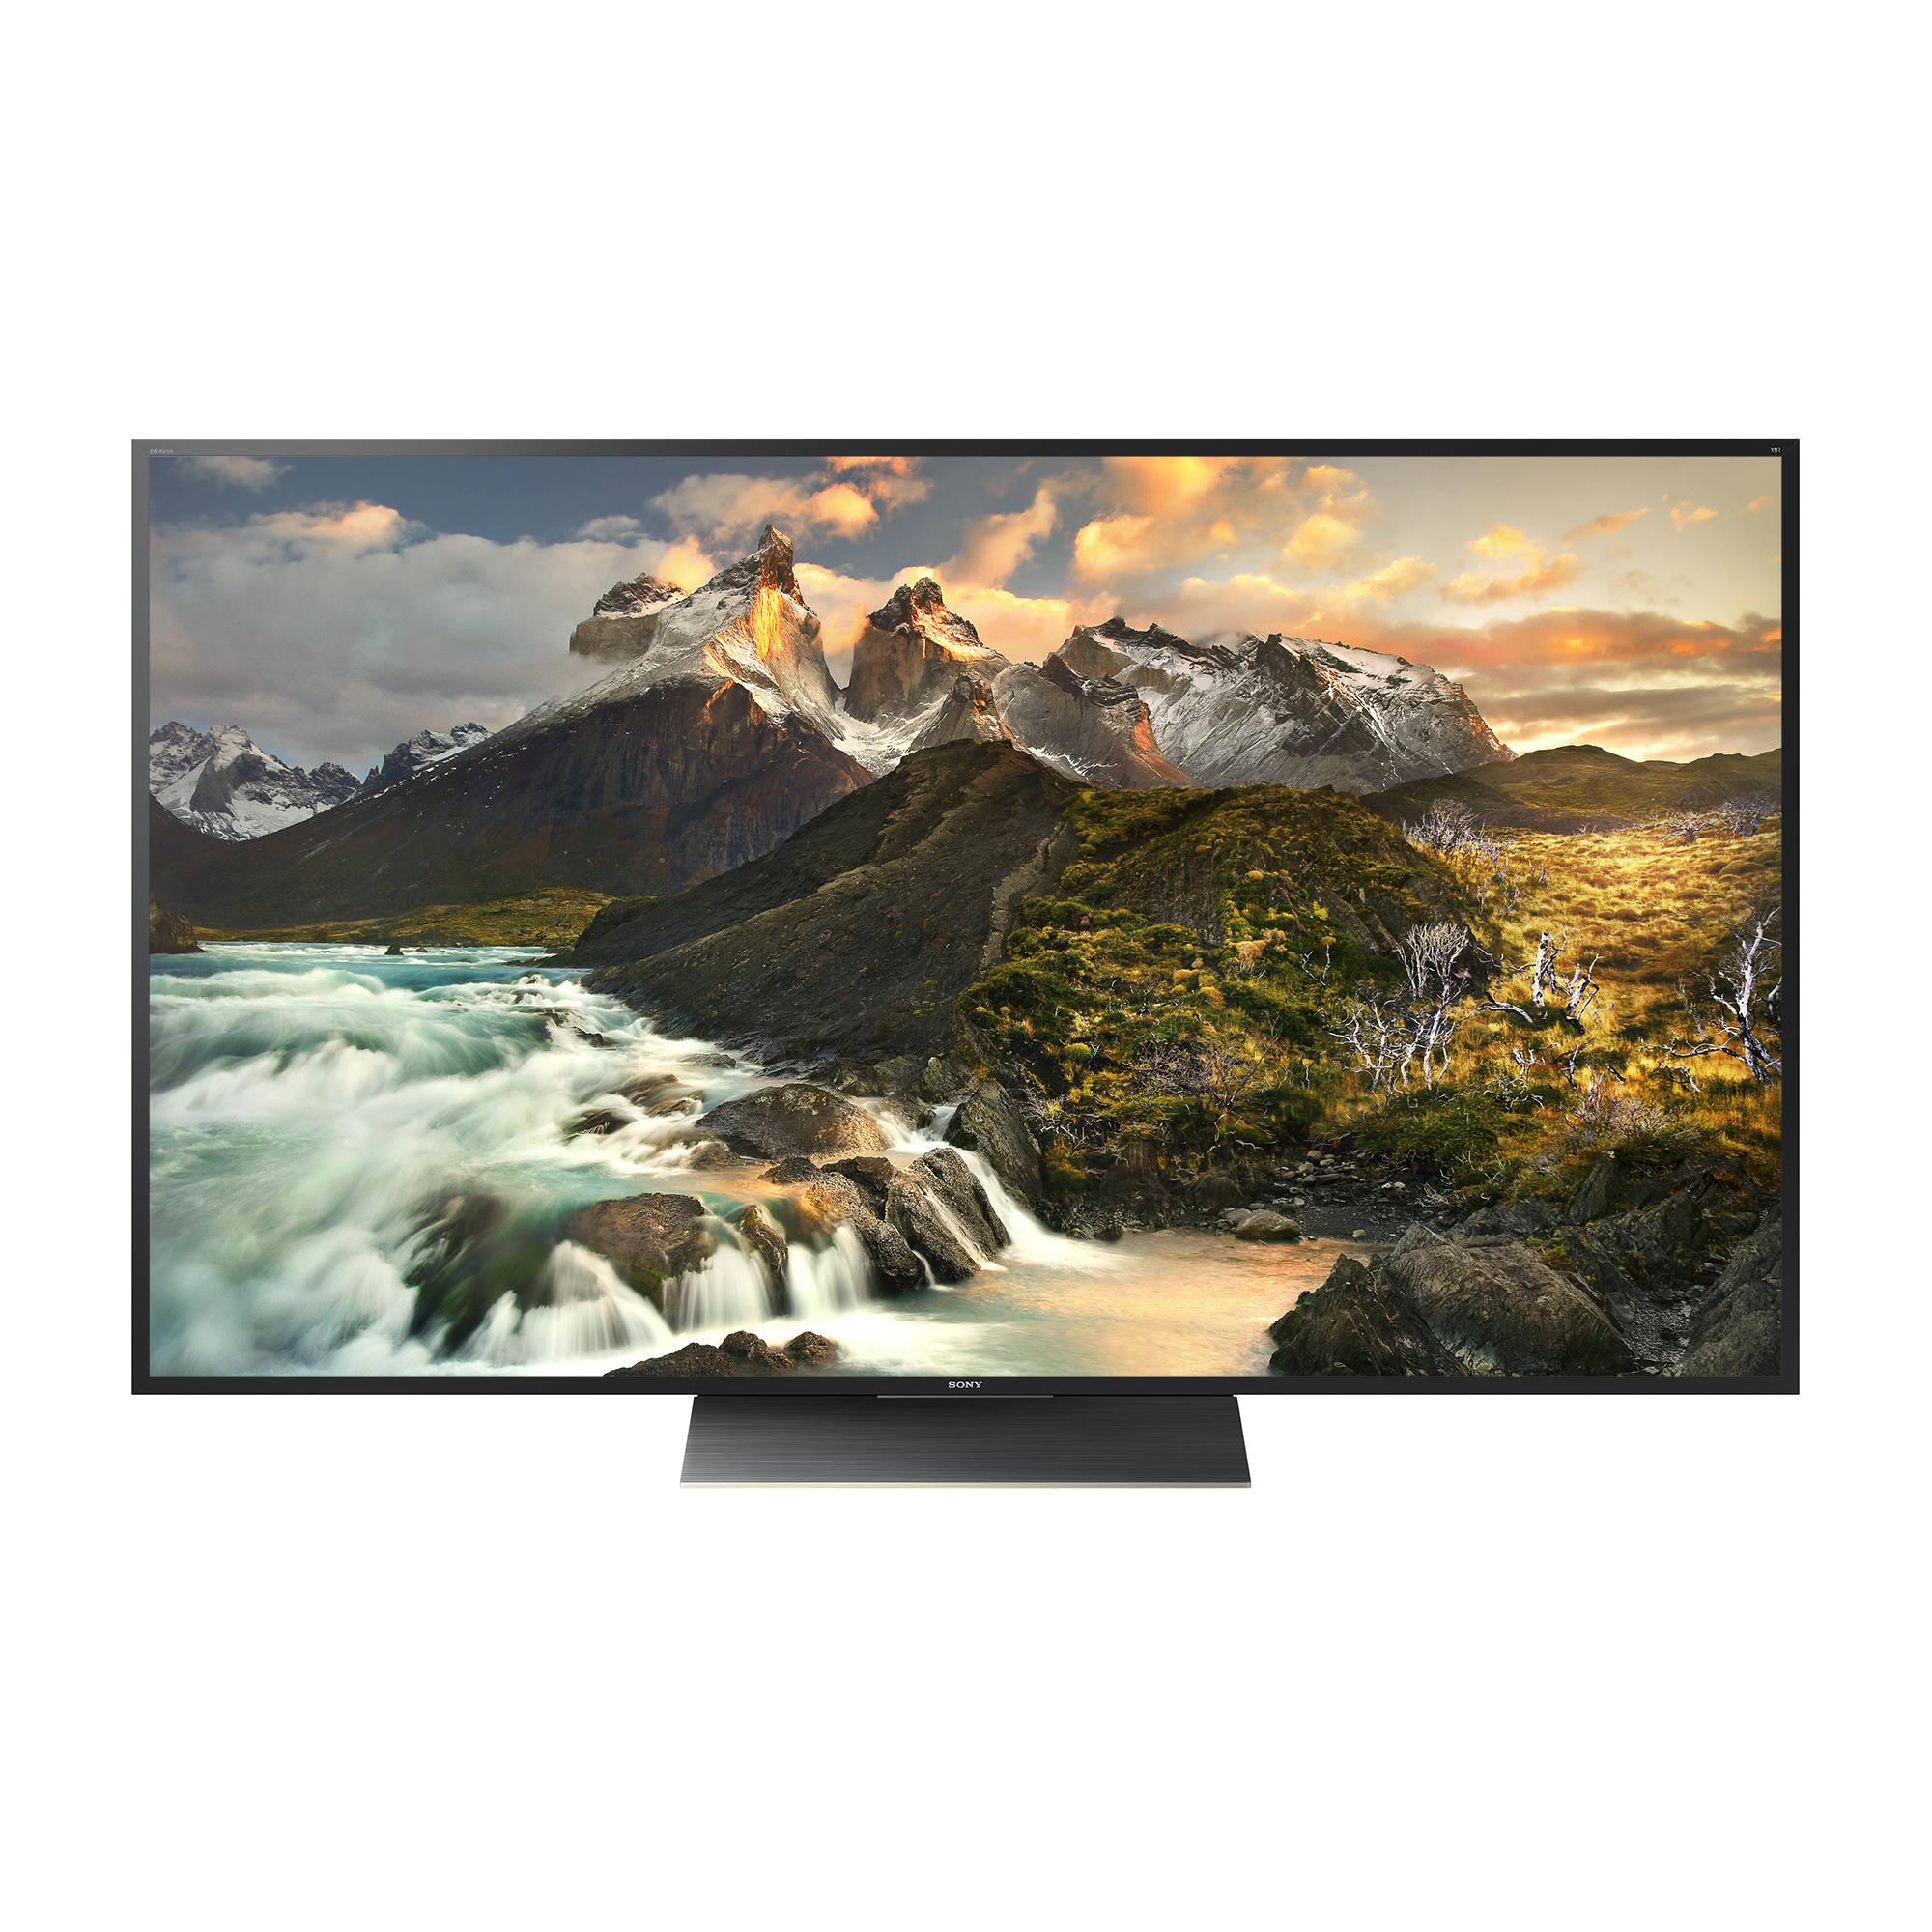 Sony Xbr Z9d Series 100 Class 4k Smart Led Tv 100z9d Remote Lcd